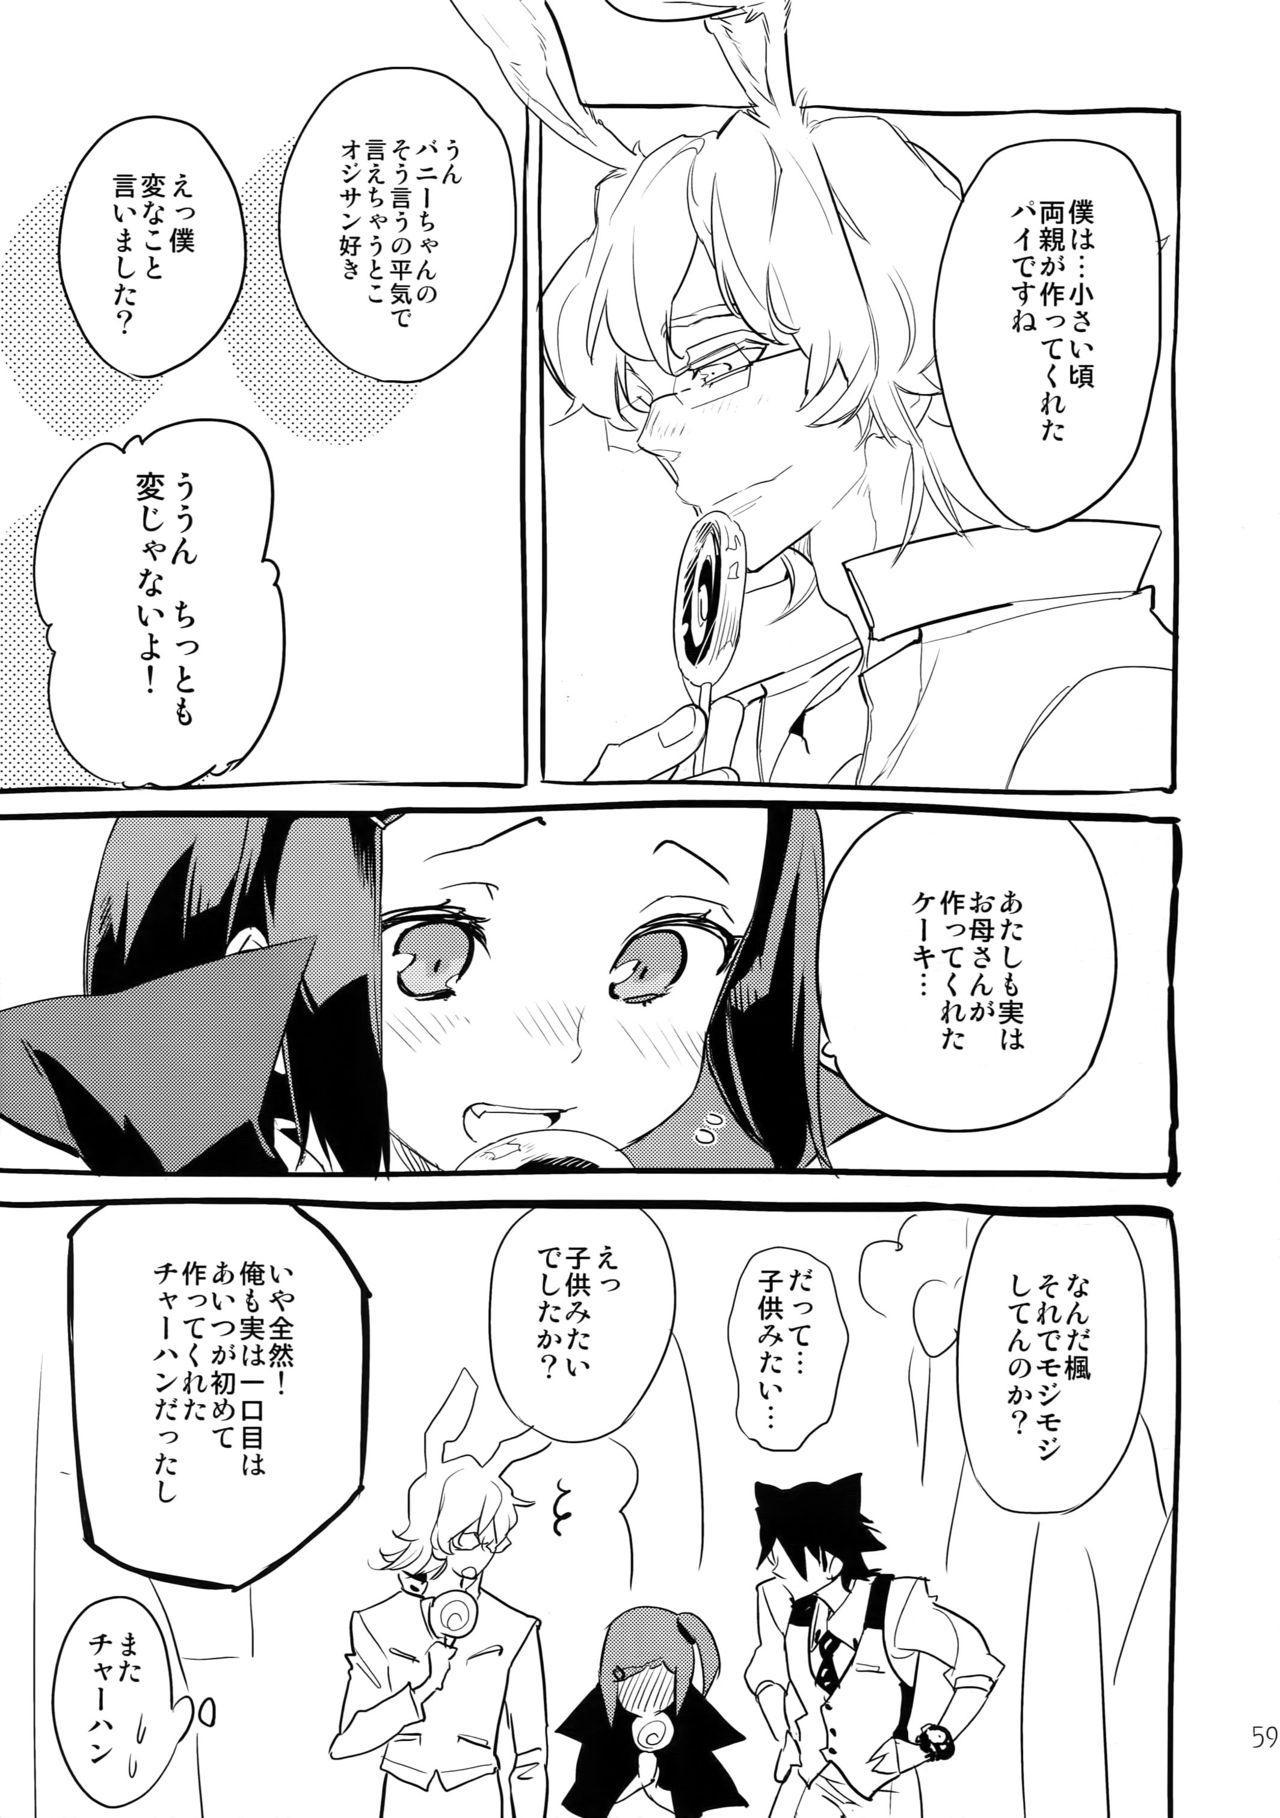 T&B Sairoku! 2 57